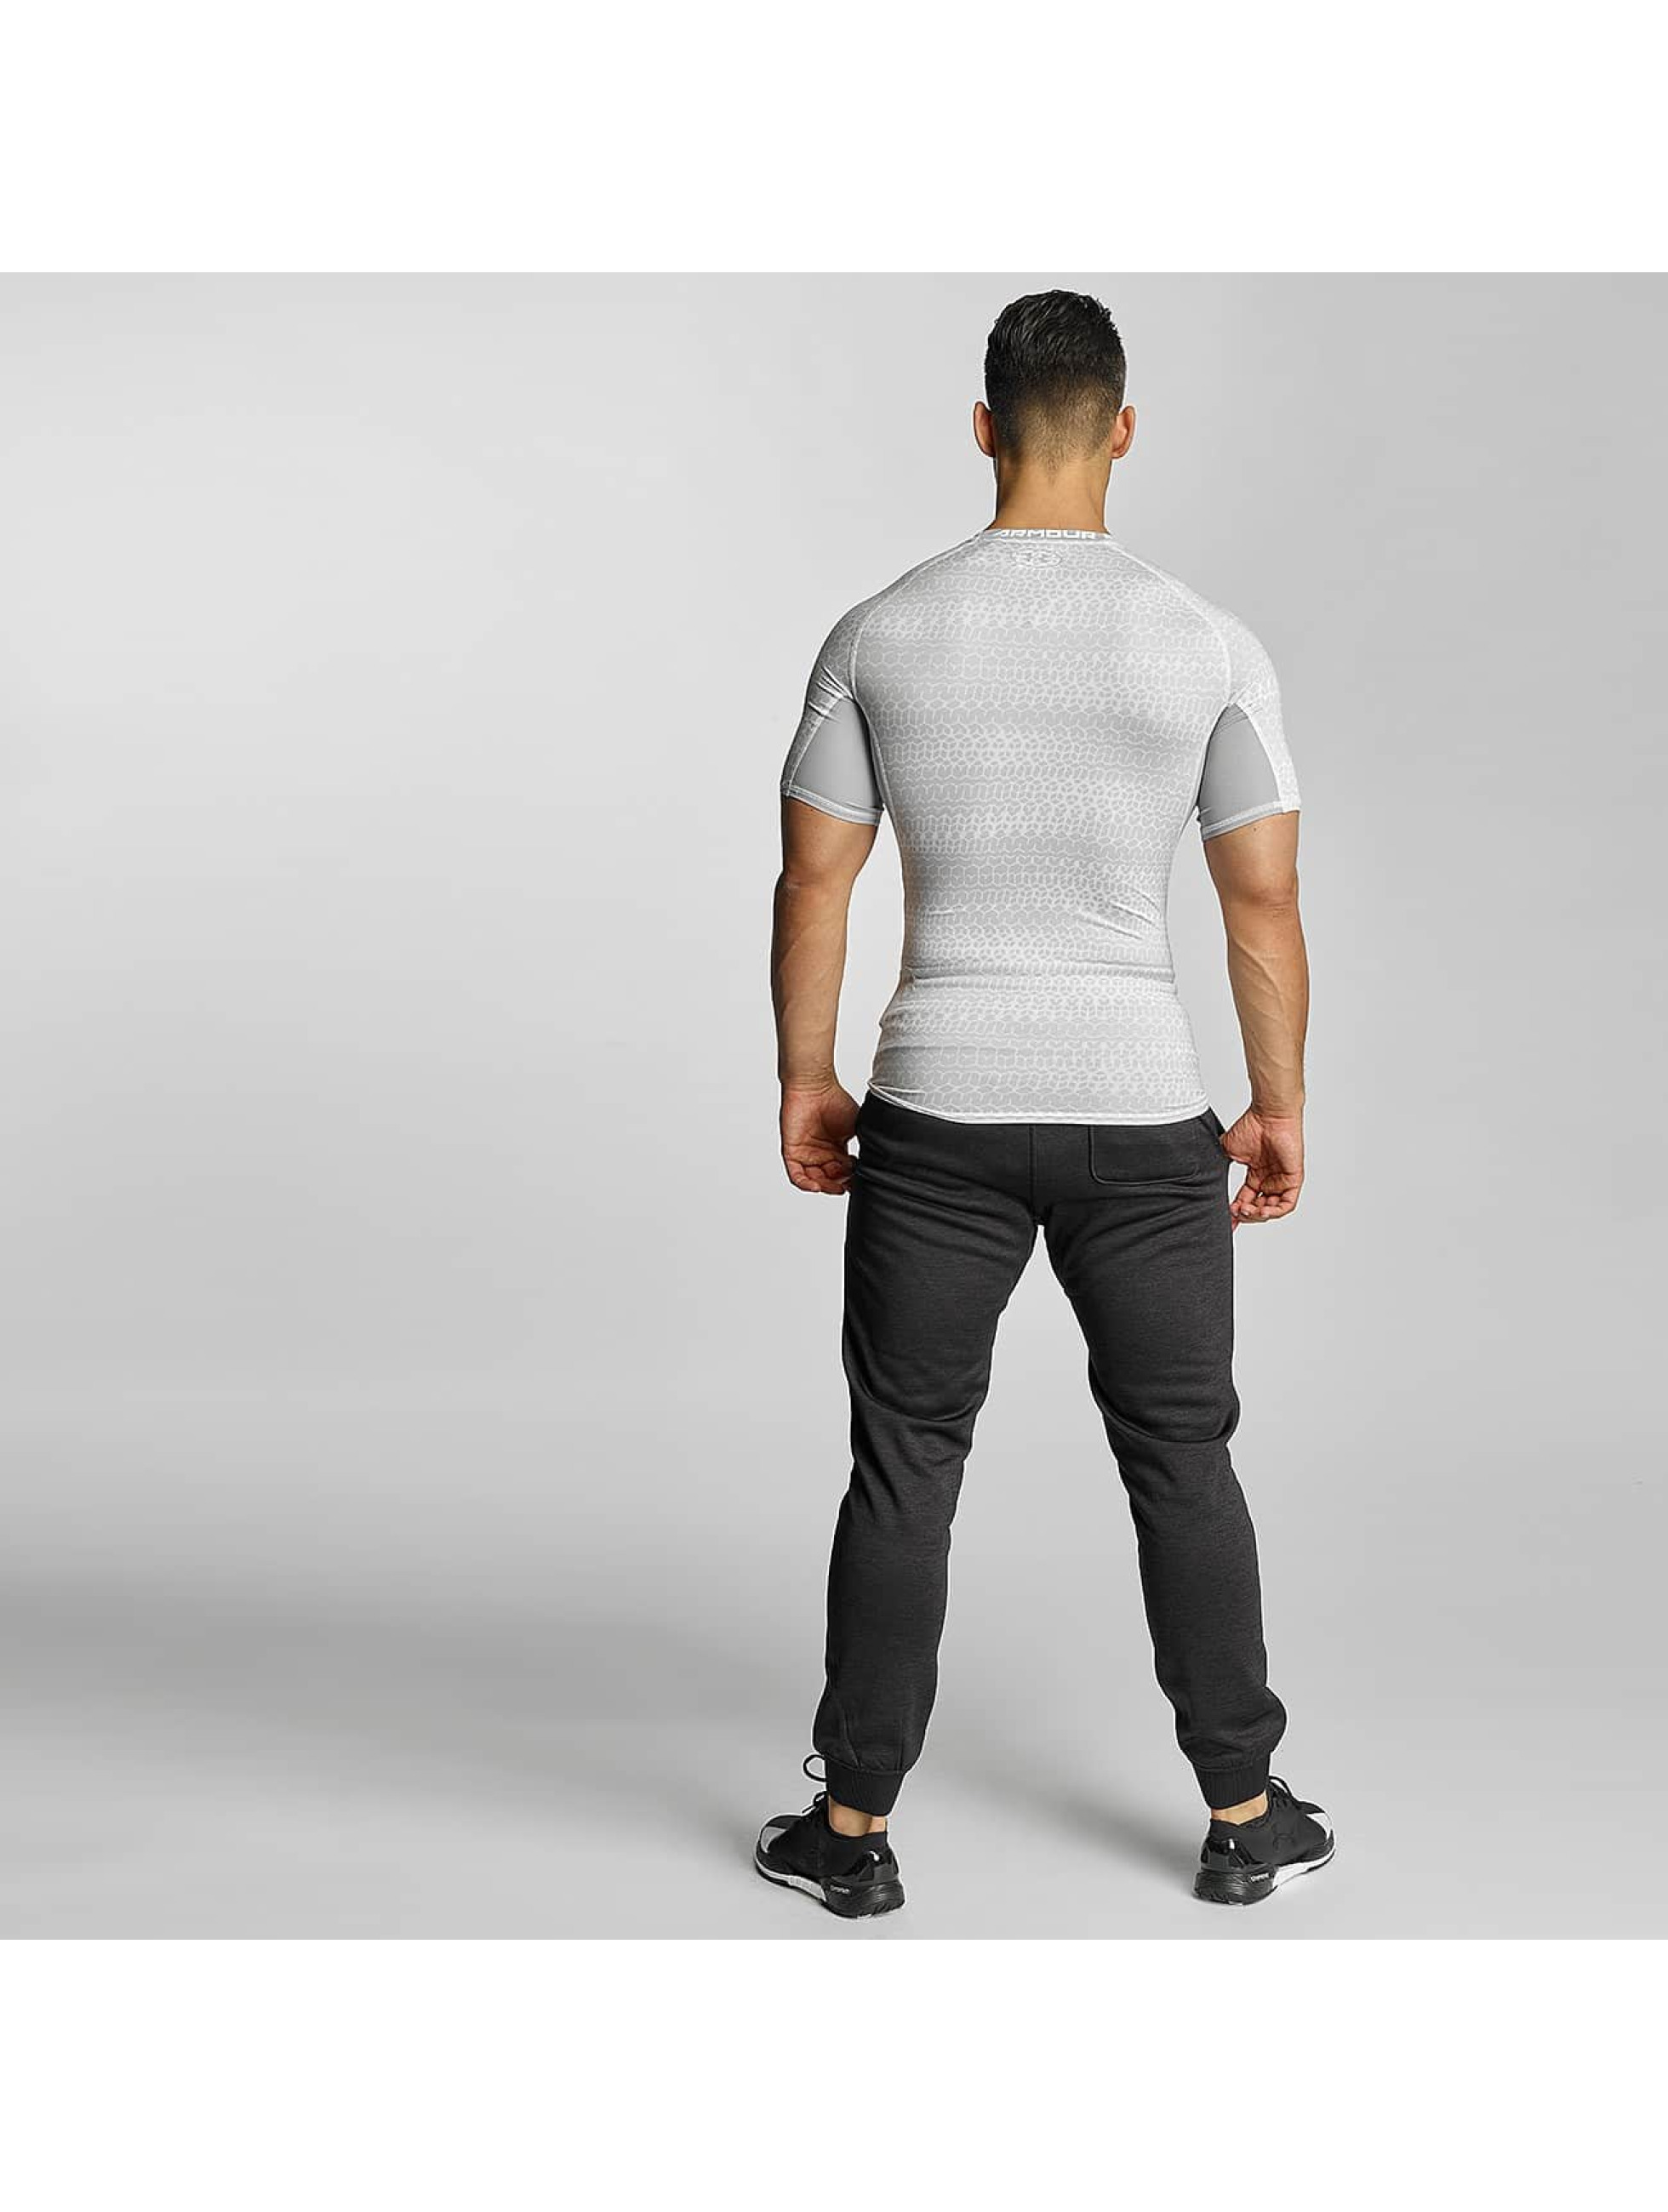 Under Armour T-Shirt Heatgear Printed Shortsleeve Compression white